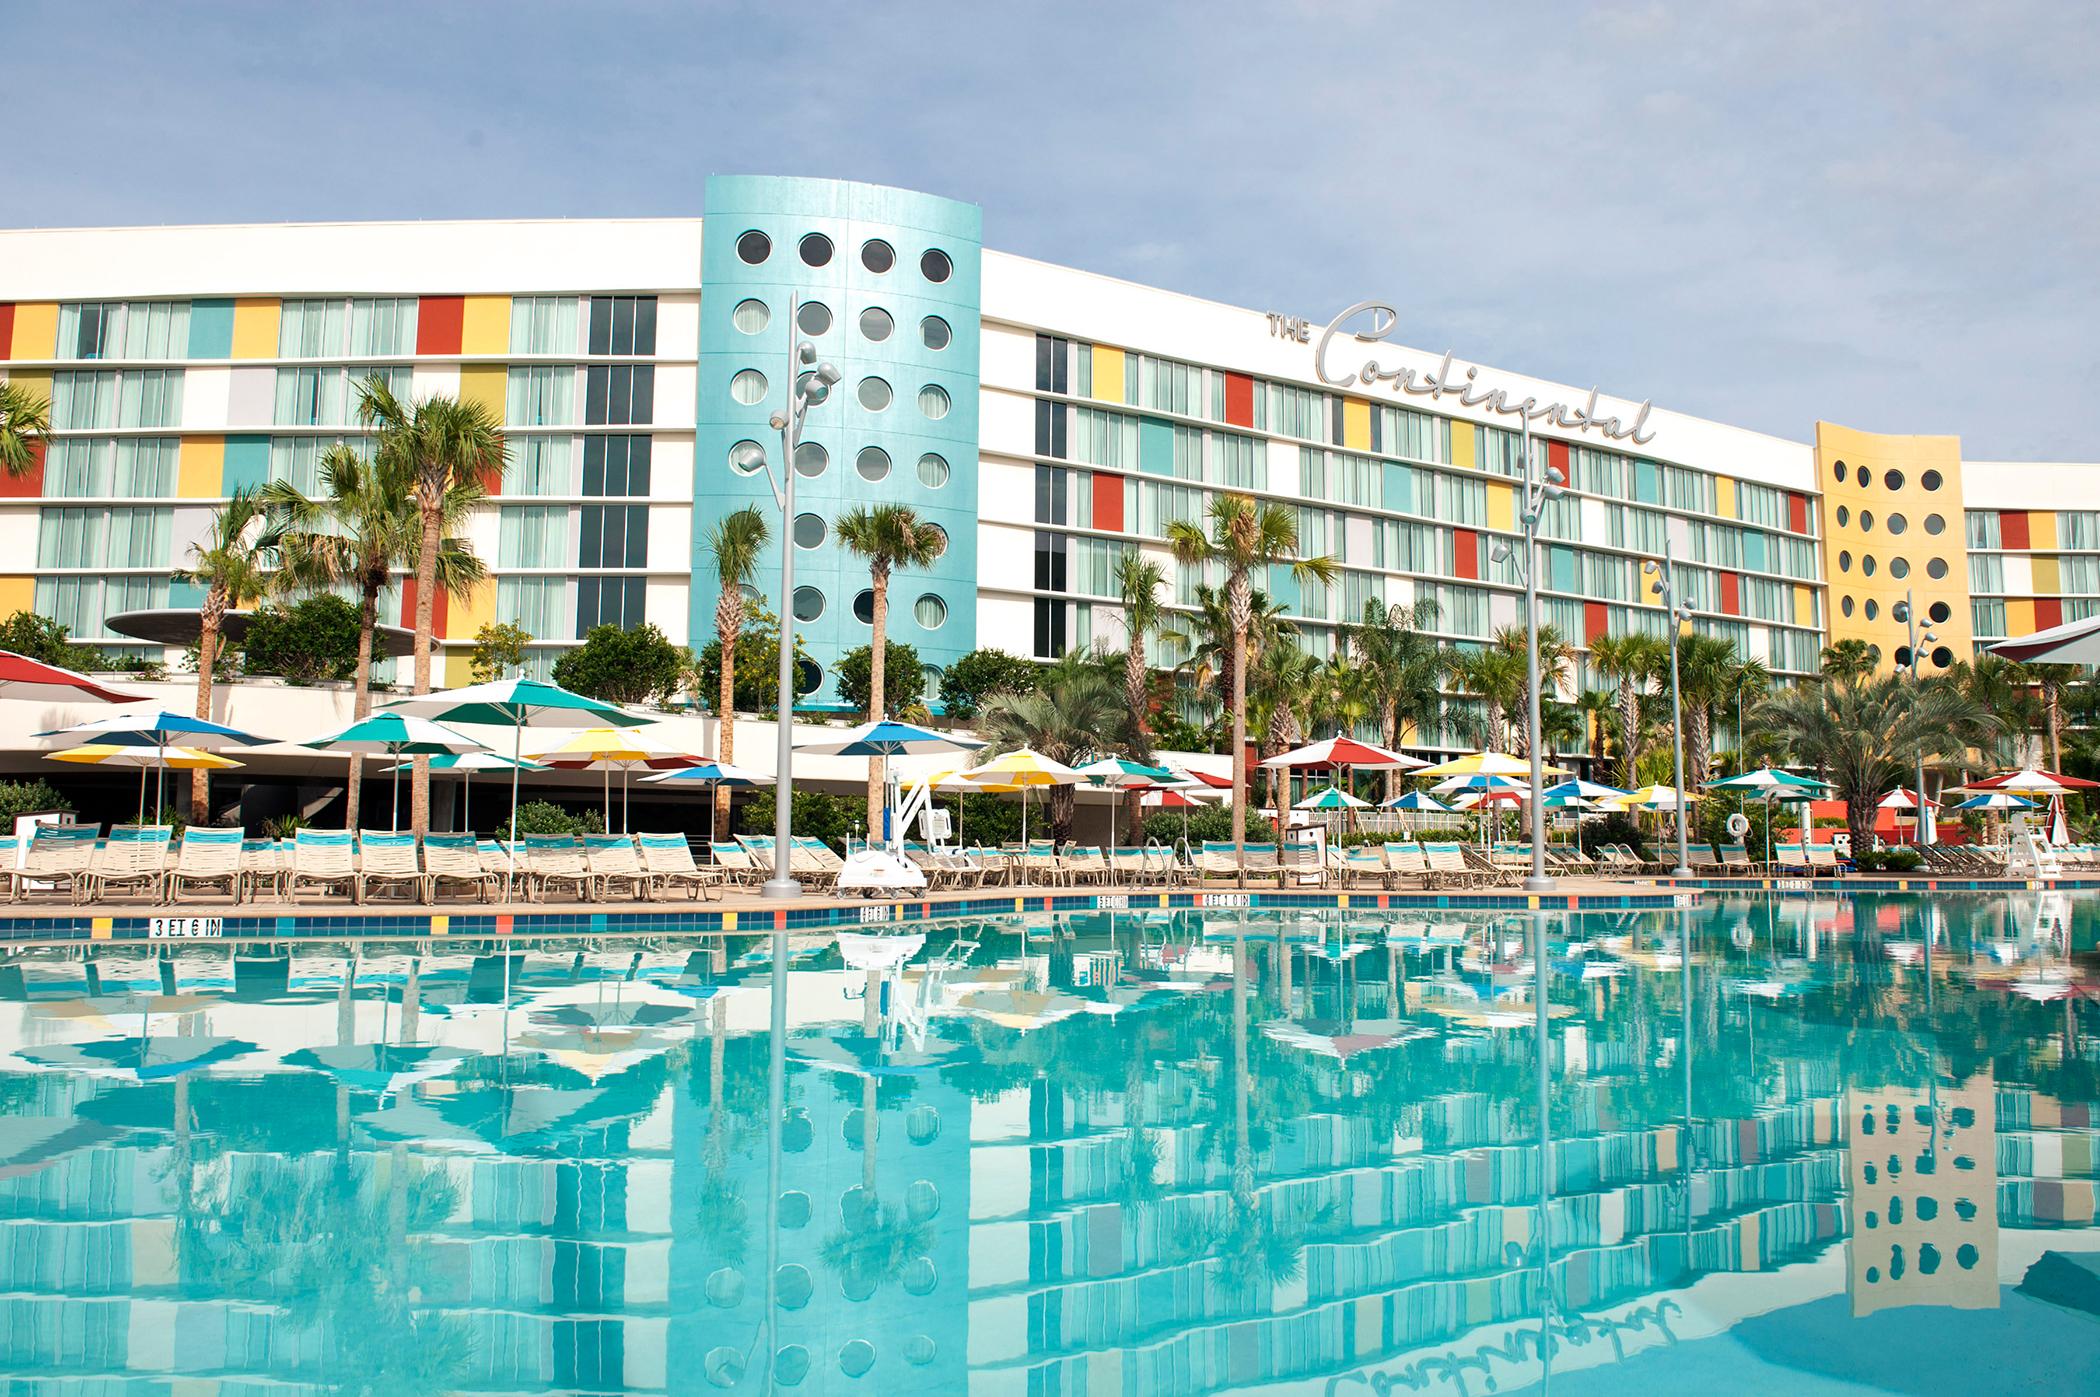 170518-universal-studios-cost-cabana-bay-beach-resort